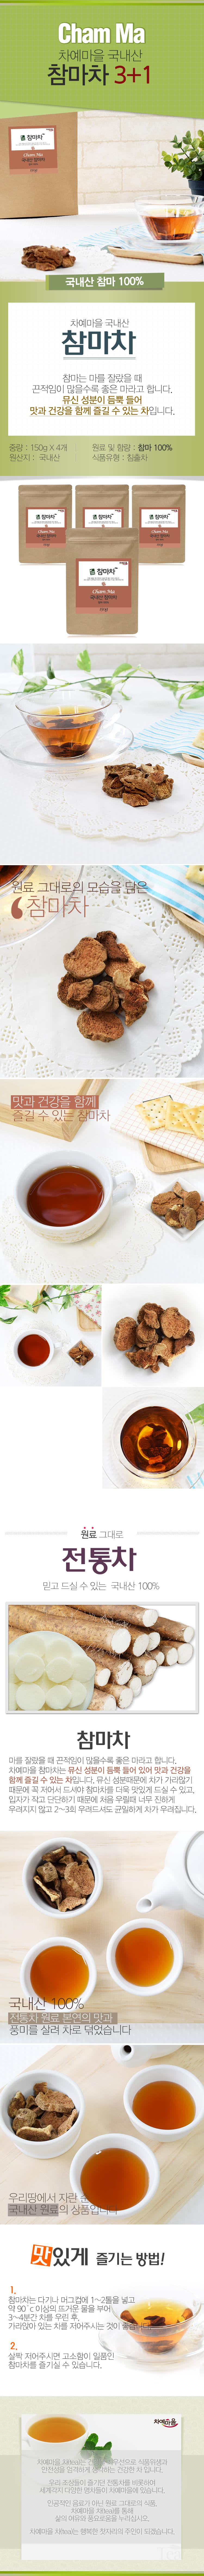 [ AndongWhiteLotus ] [ChayeTown]Korean Yam Tea 150g 3+1개